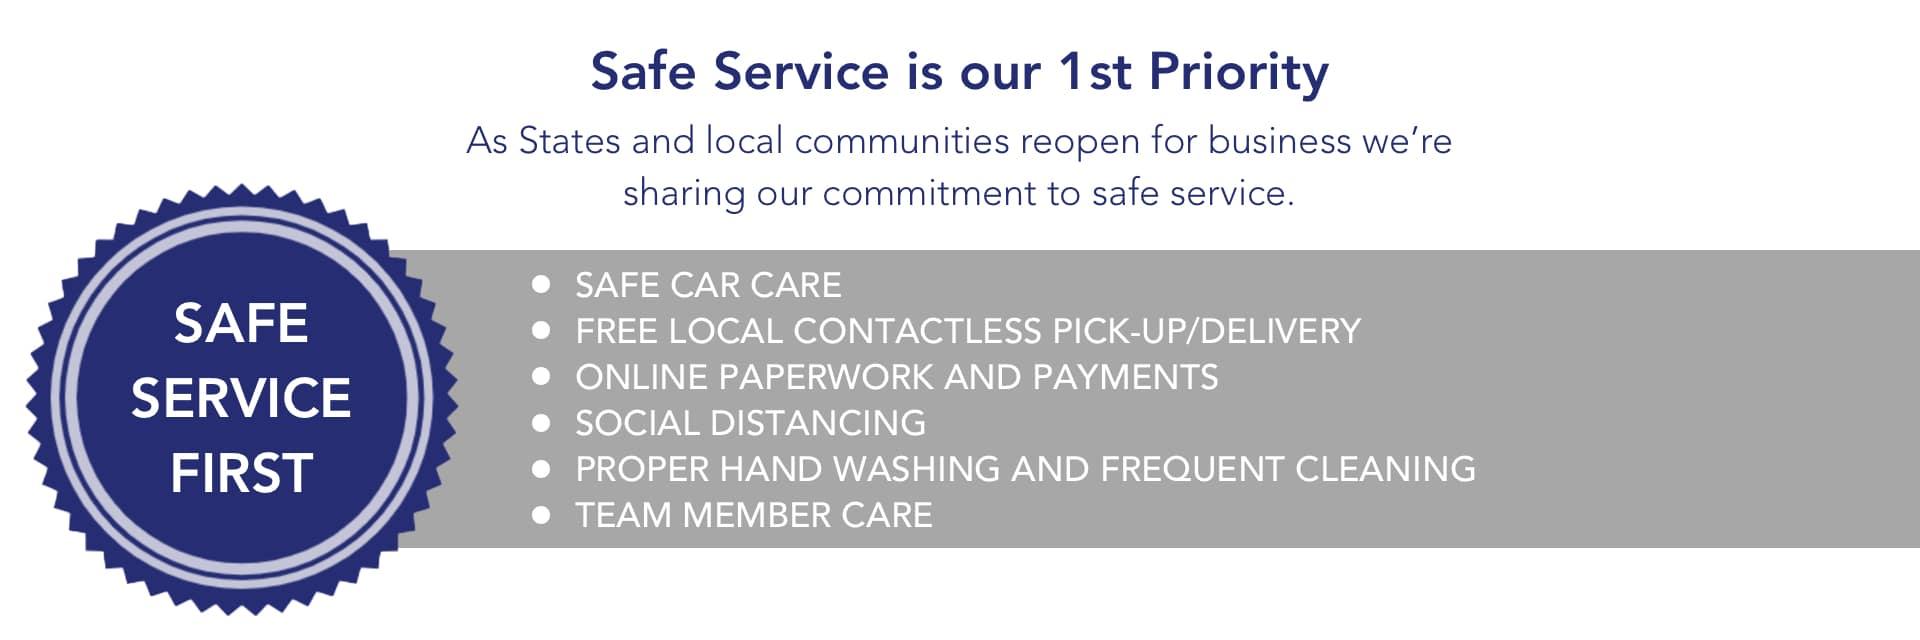 Safe Service